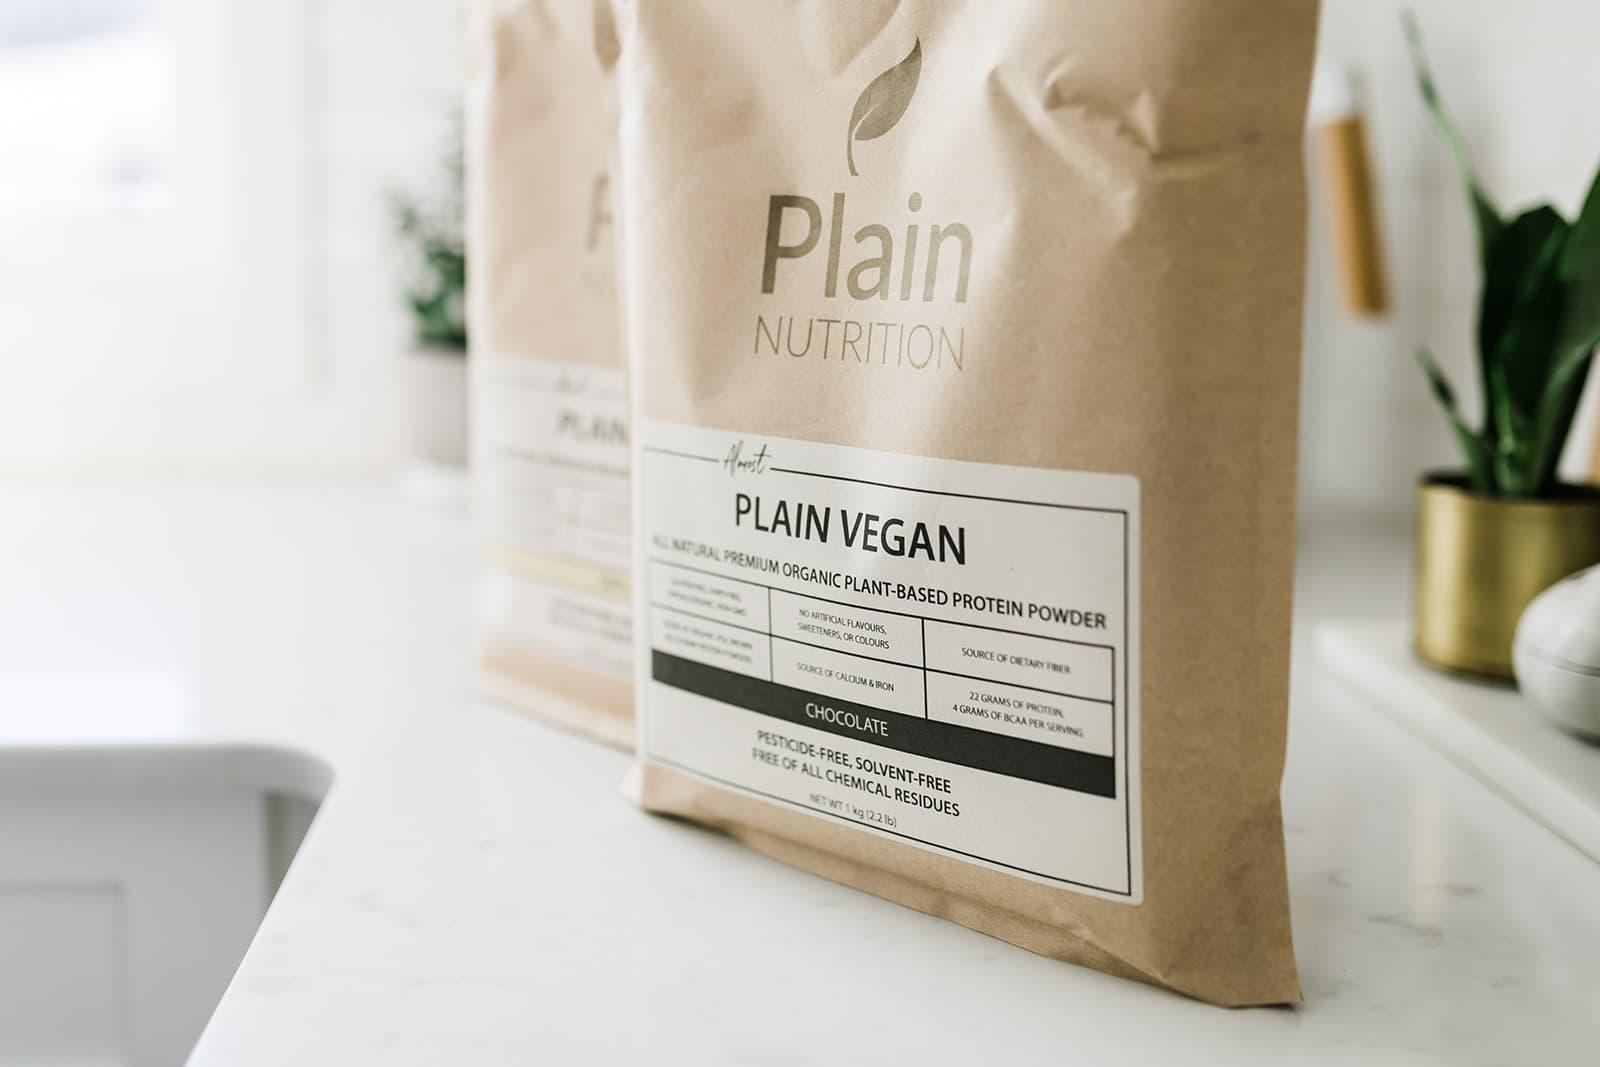 Vegan protein blends